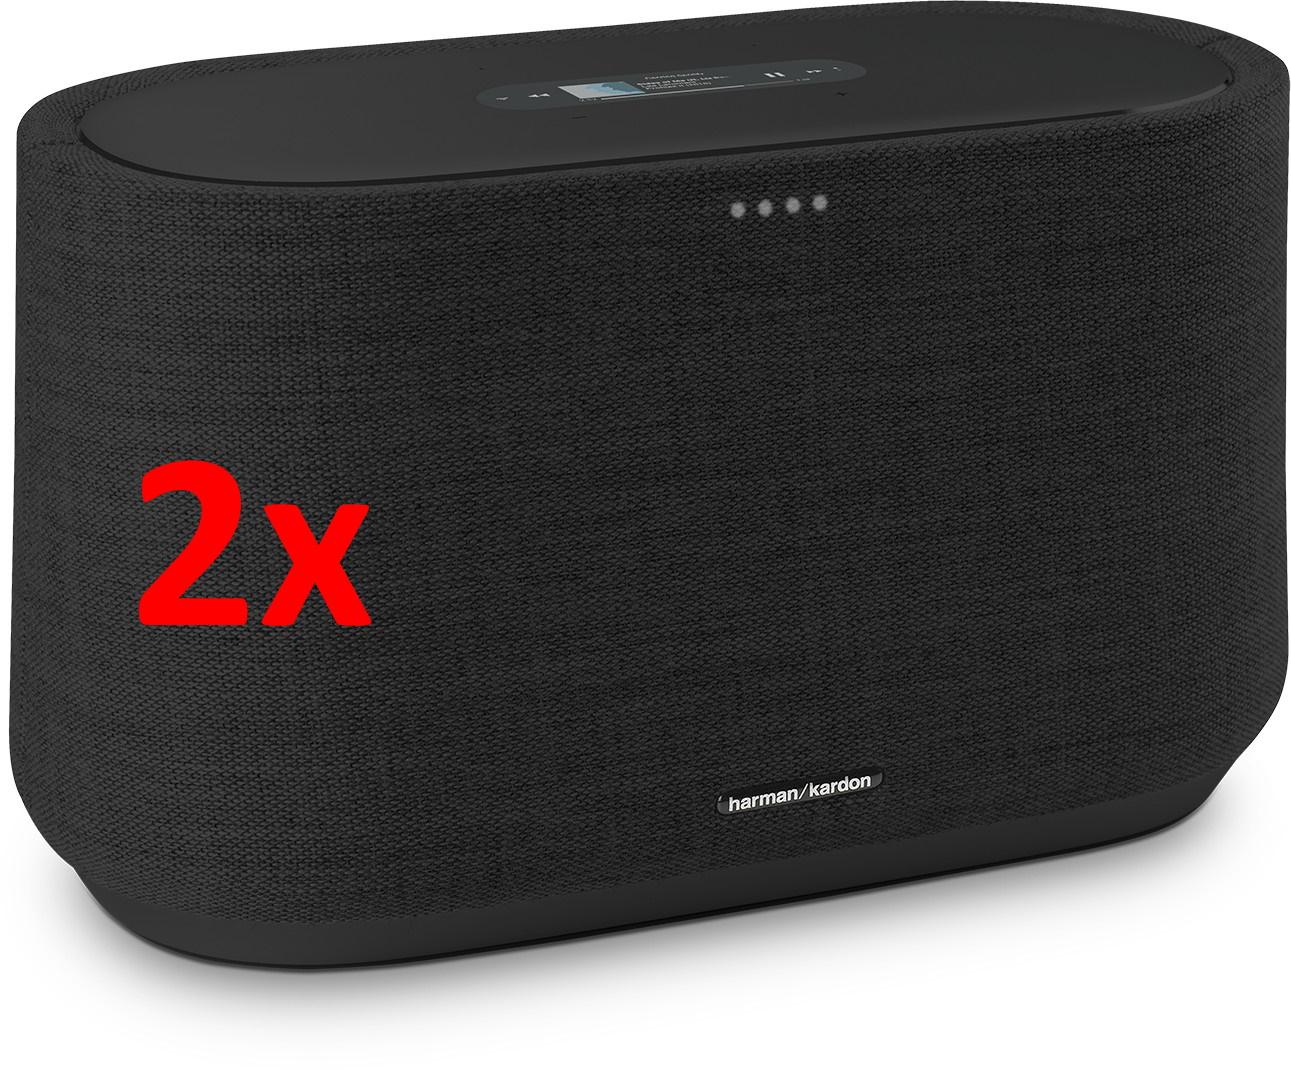 [Refurbished] 2x Harman Kardon Citation 300 Multiroom-Lautsprecher (100W, WLAN, Bluetooth, Internetradio, Google Cast, AirPlay 2)